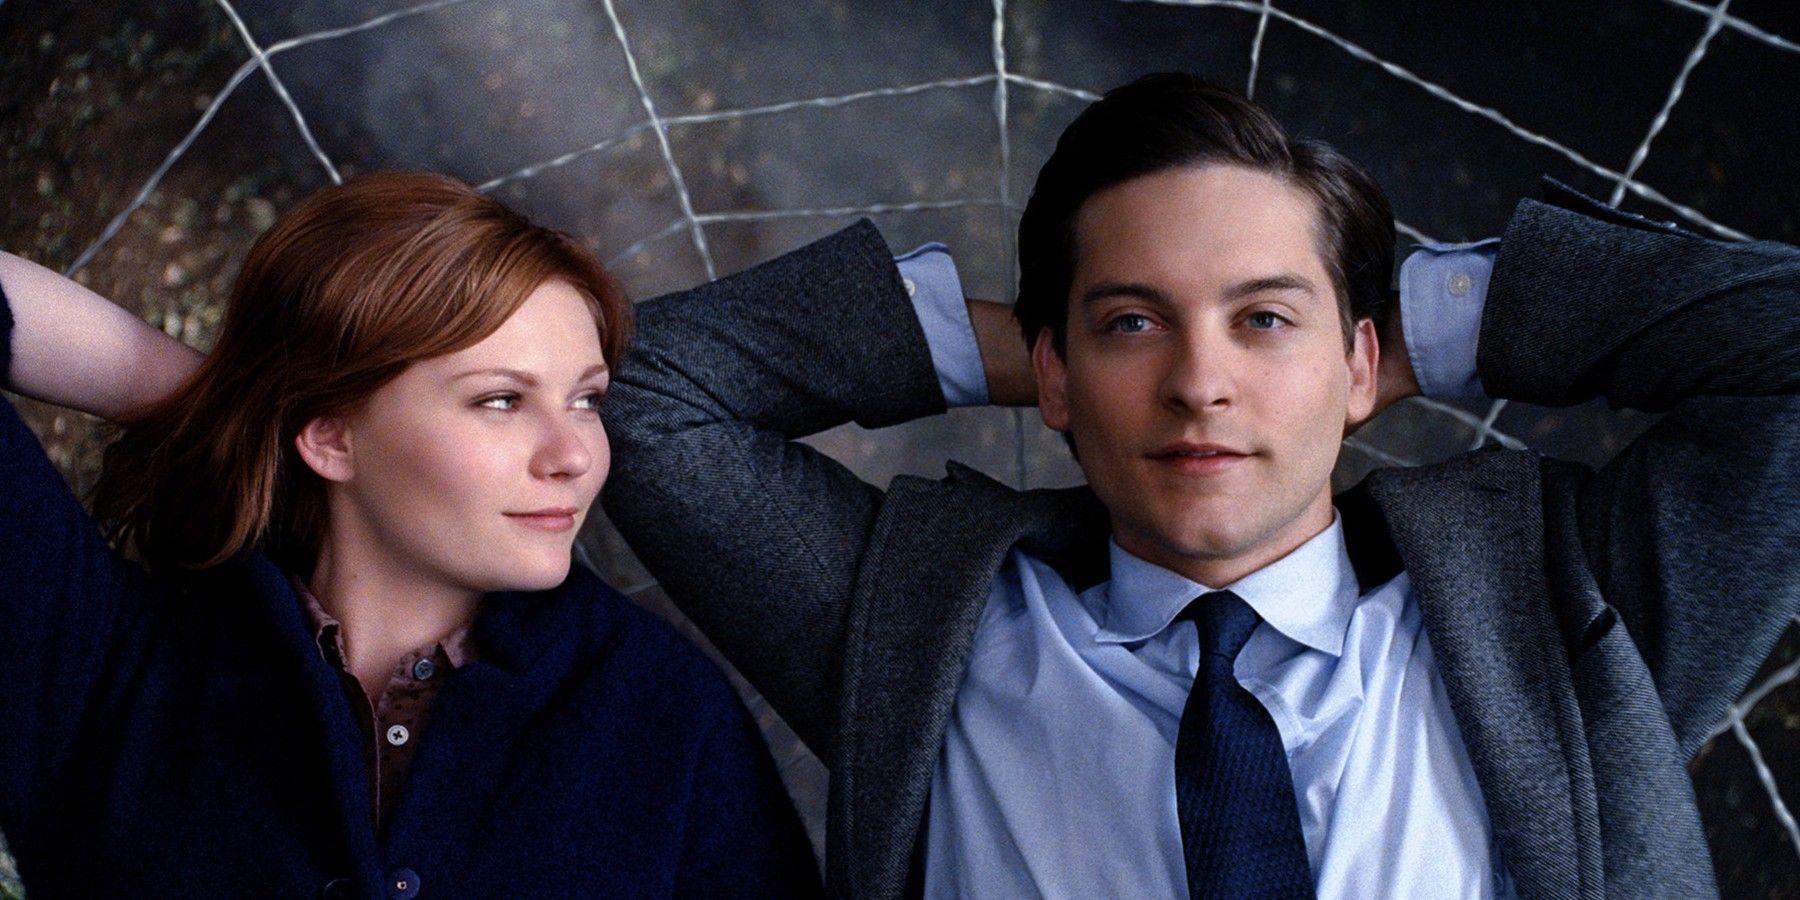 Spider-Man 3: Tobey Maguire In Talks To Return With Kirsten Dunst